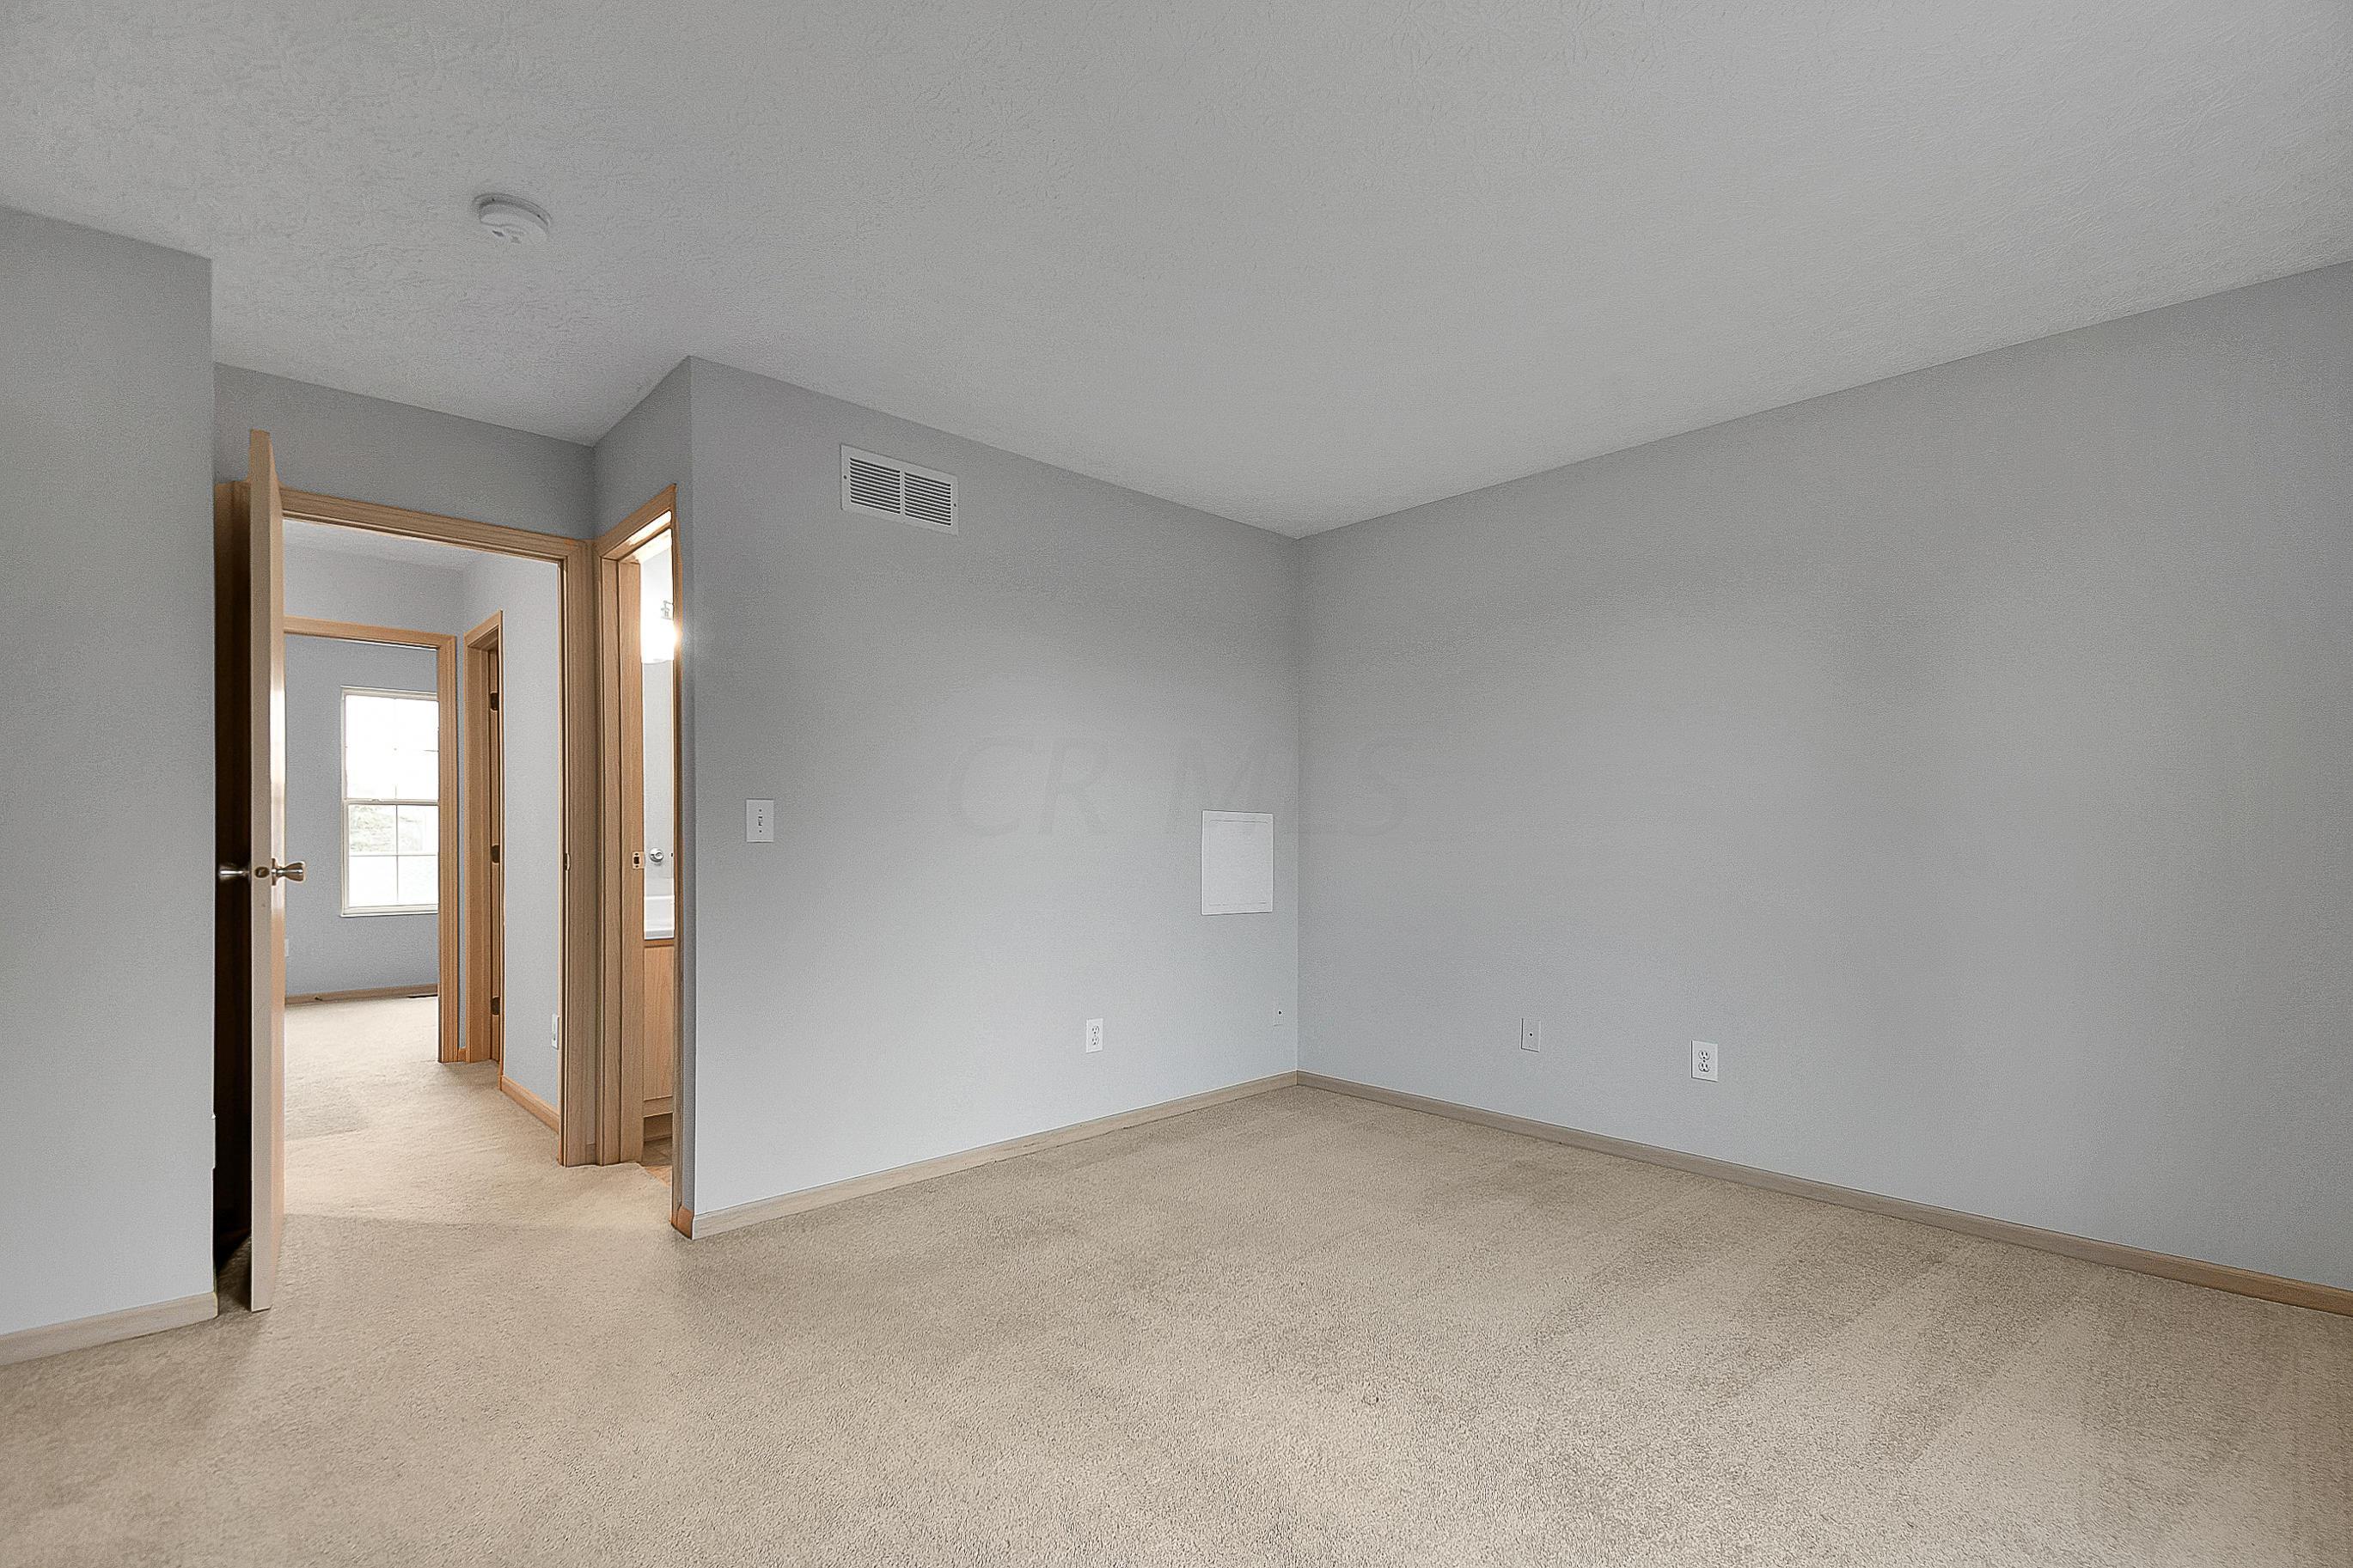 2260 Sandman Drive, Columbus, Ohio 43235, 2 Bedrooms Bedrooms, ,3 BathroomsBathrooms,Residential,For Sale,Sandman,220041131